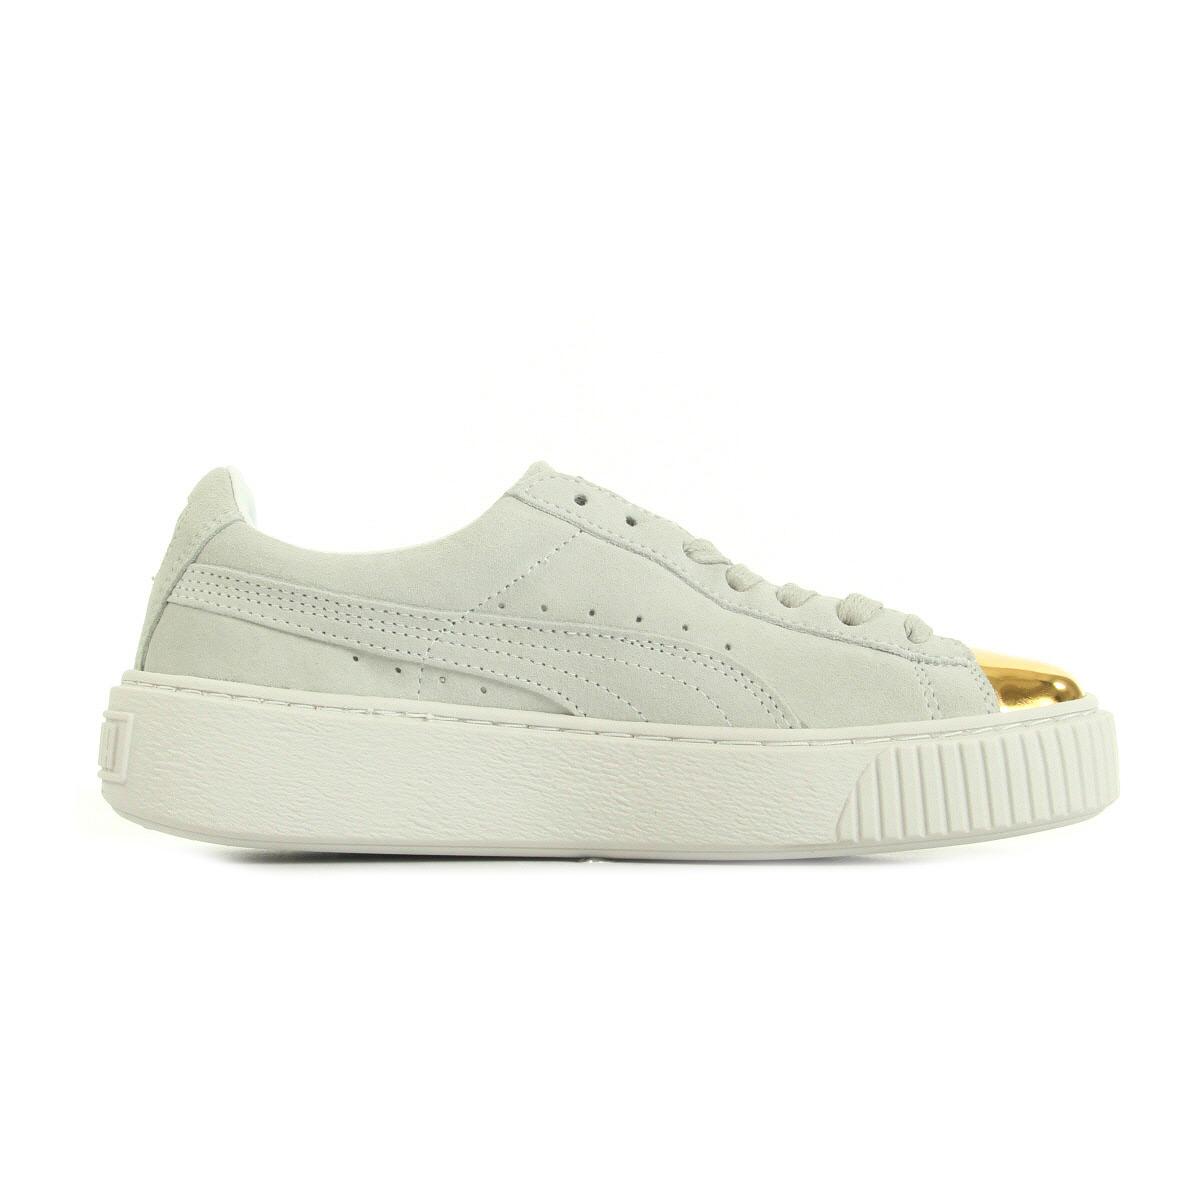 chaussures baskets puma femme suede platform gold taille gris grise cuir lacets ebay. Black Bedroom Furniture Sets. Home Design Ideas